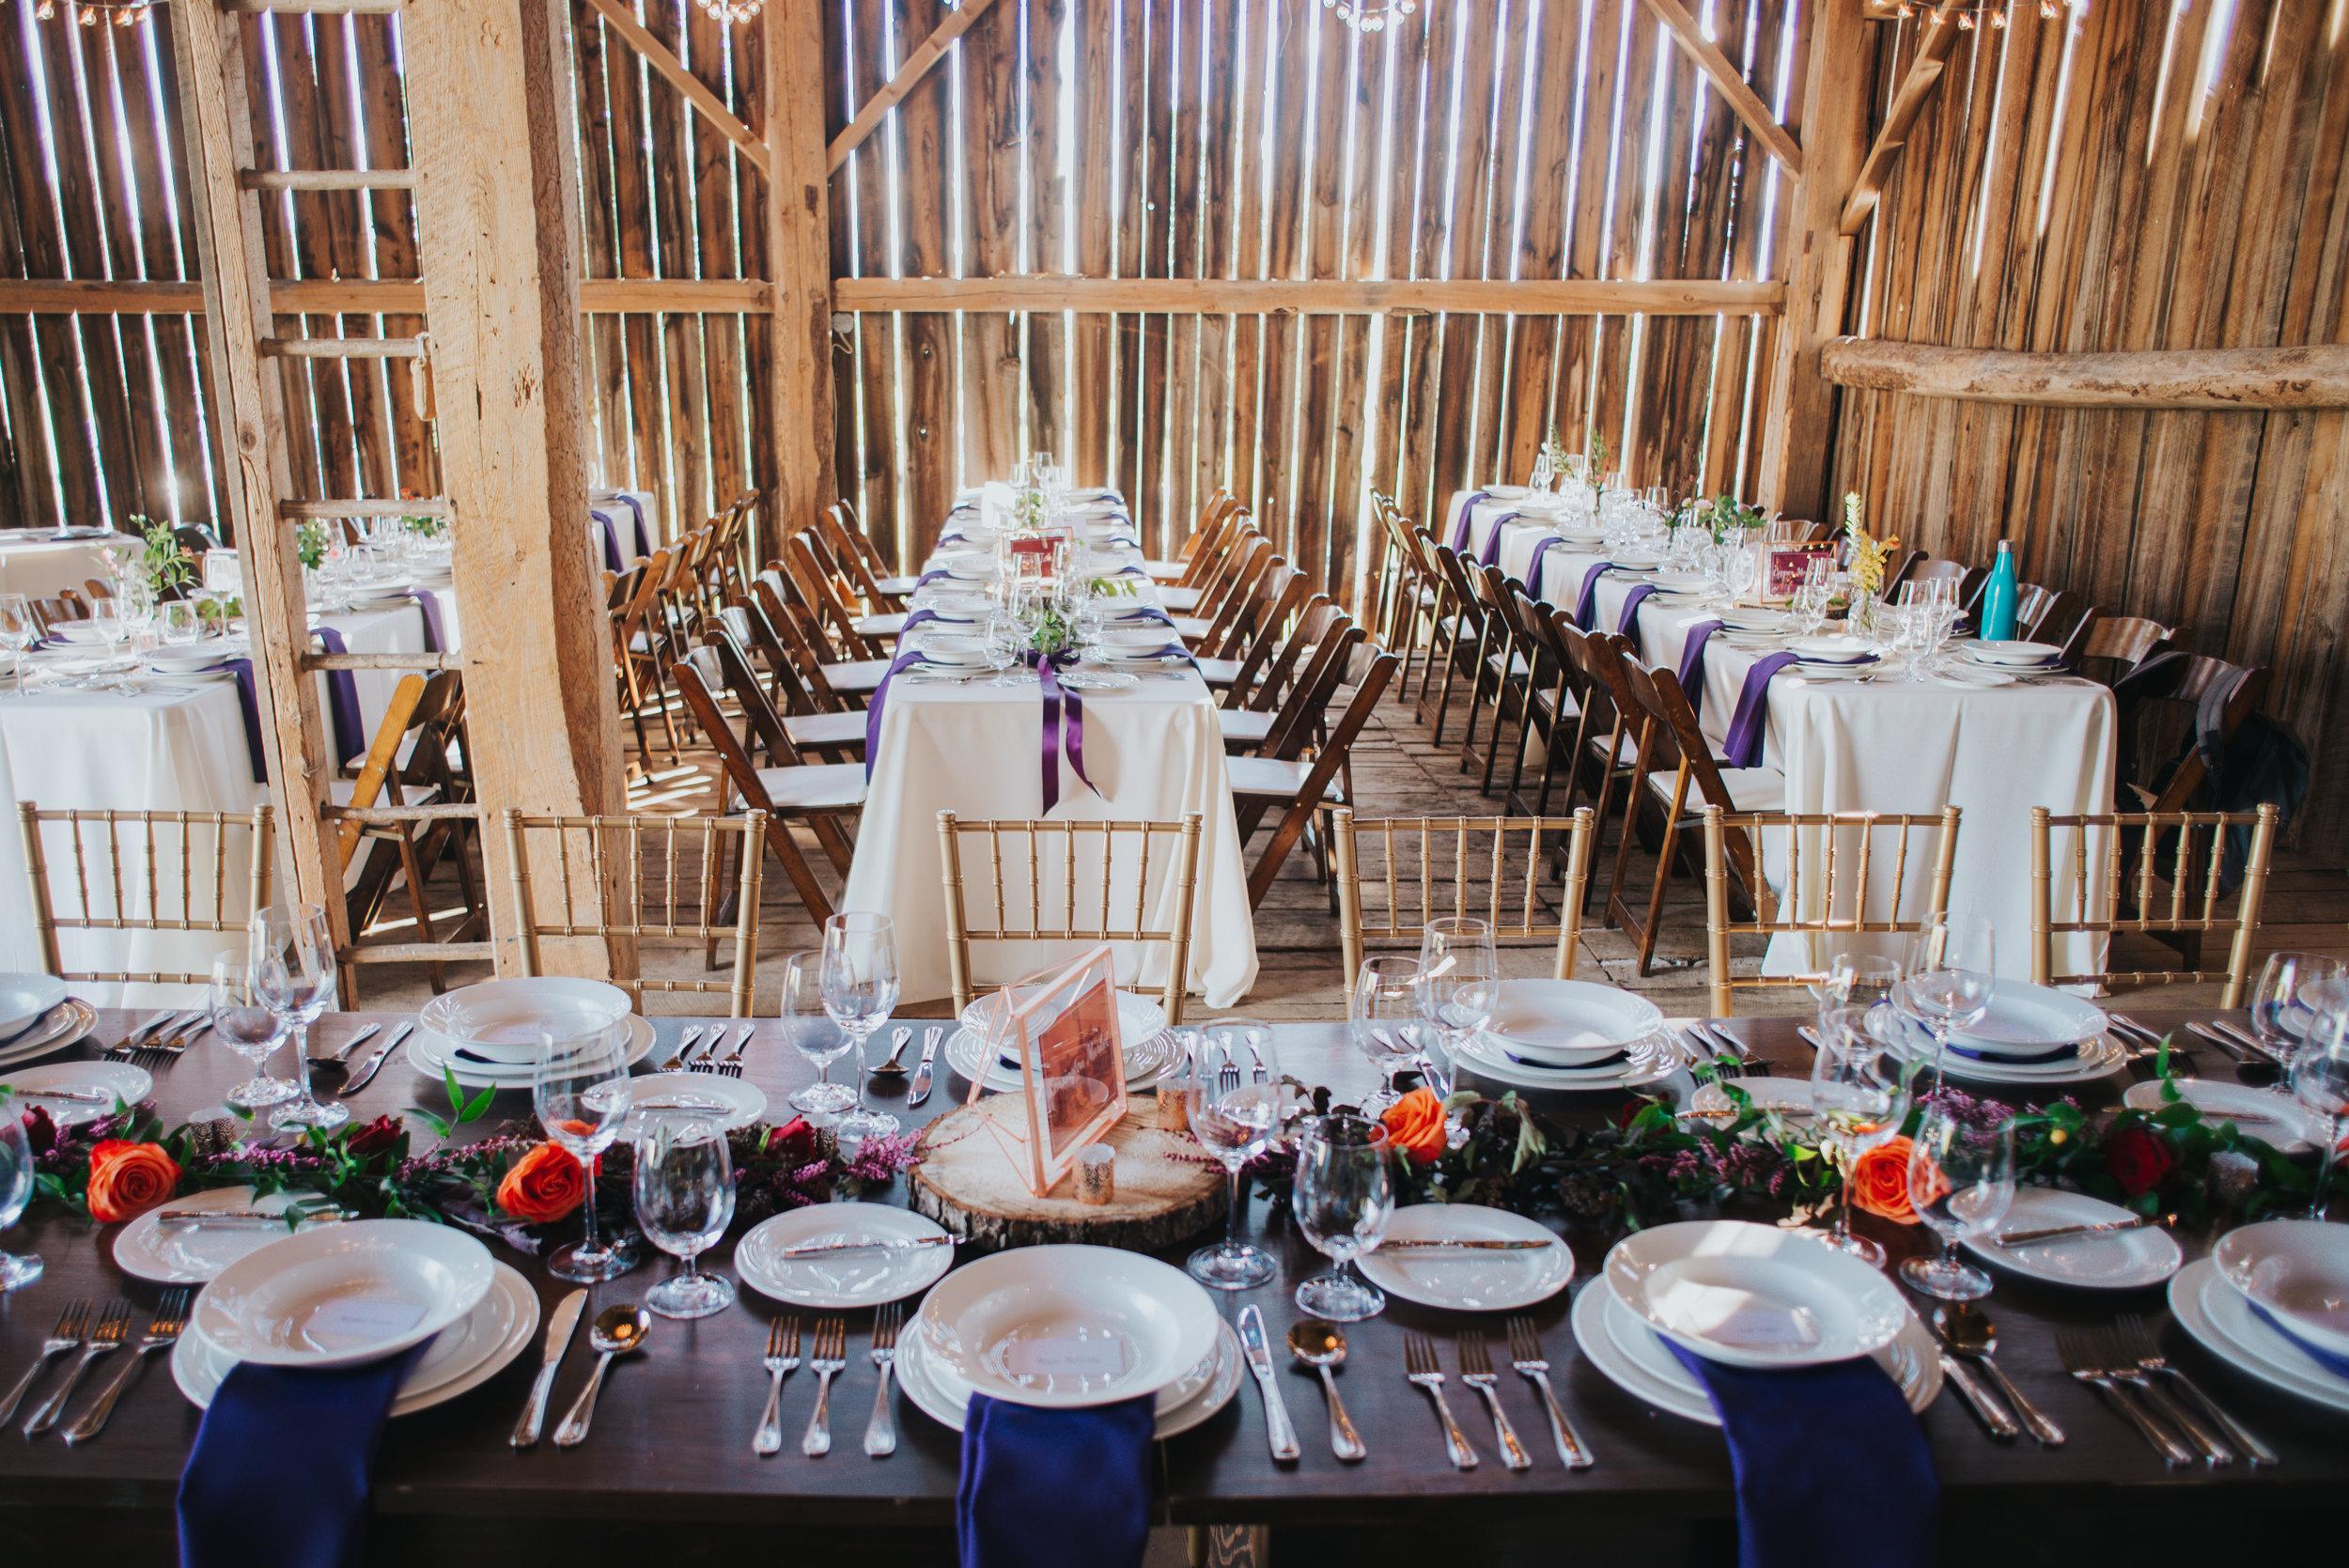 Cosgrove Barn, Havelock ON Photo Credit: Lauren McCormick Photography